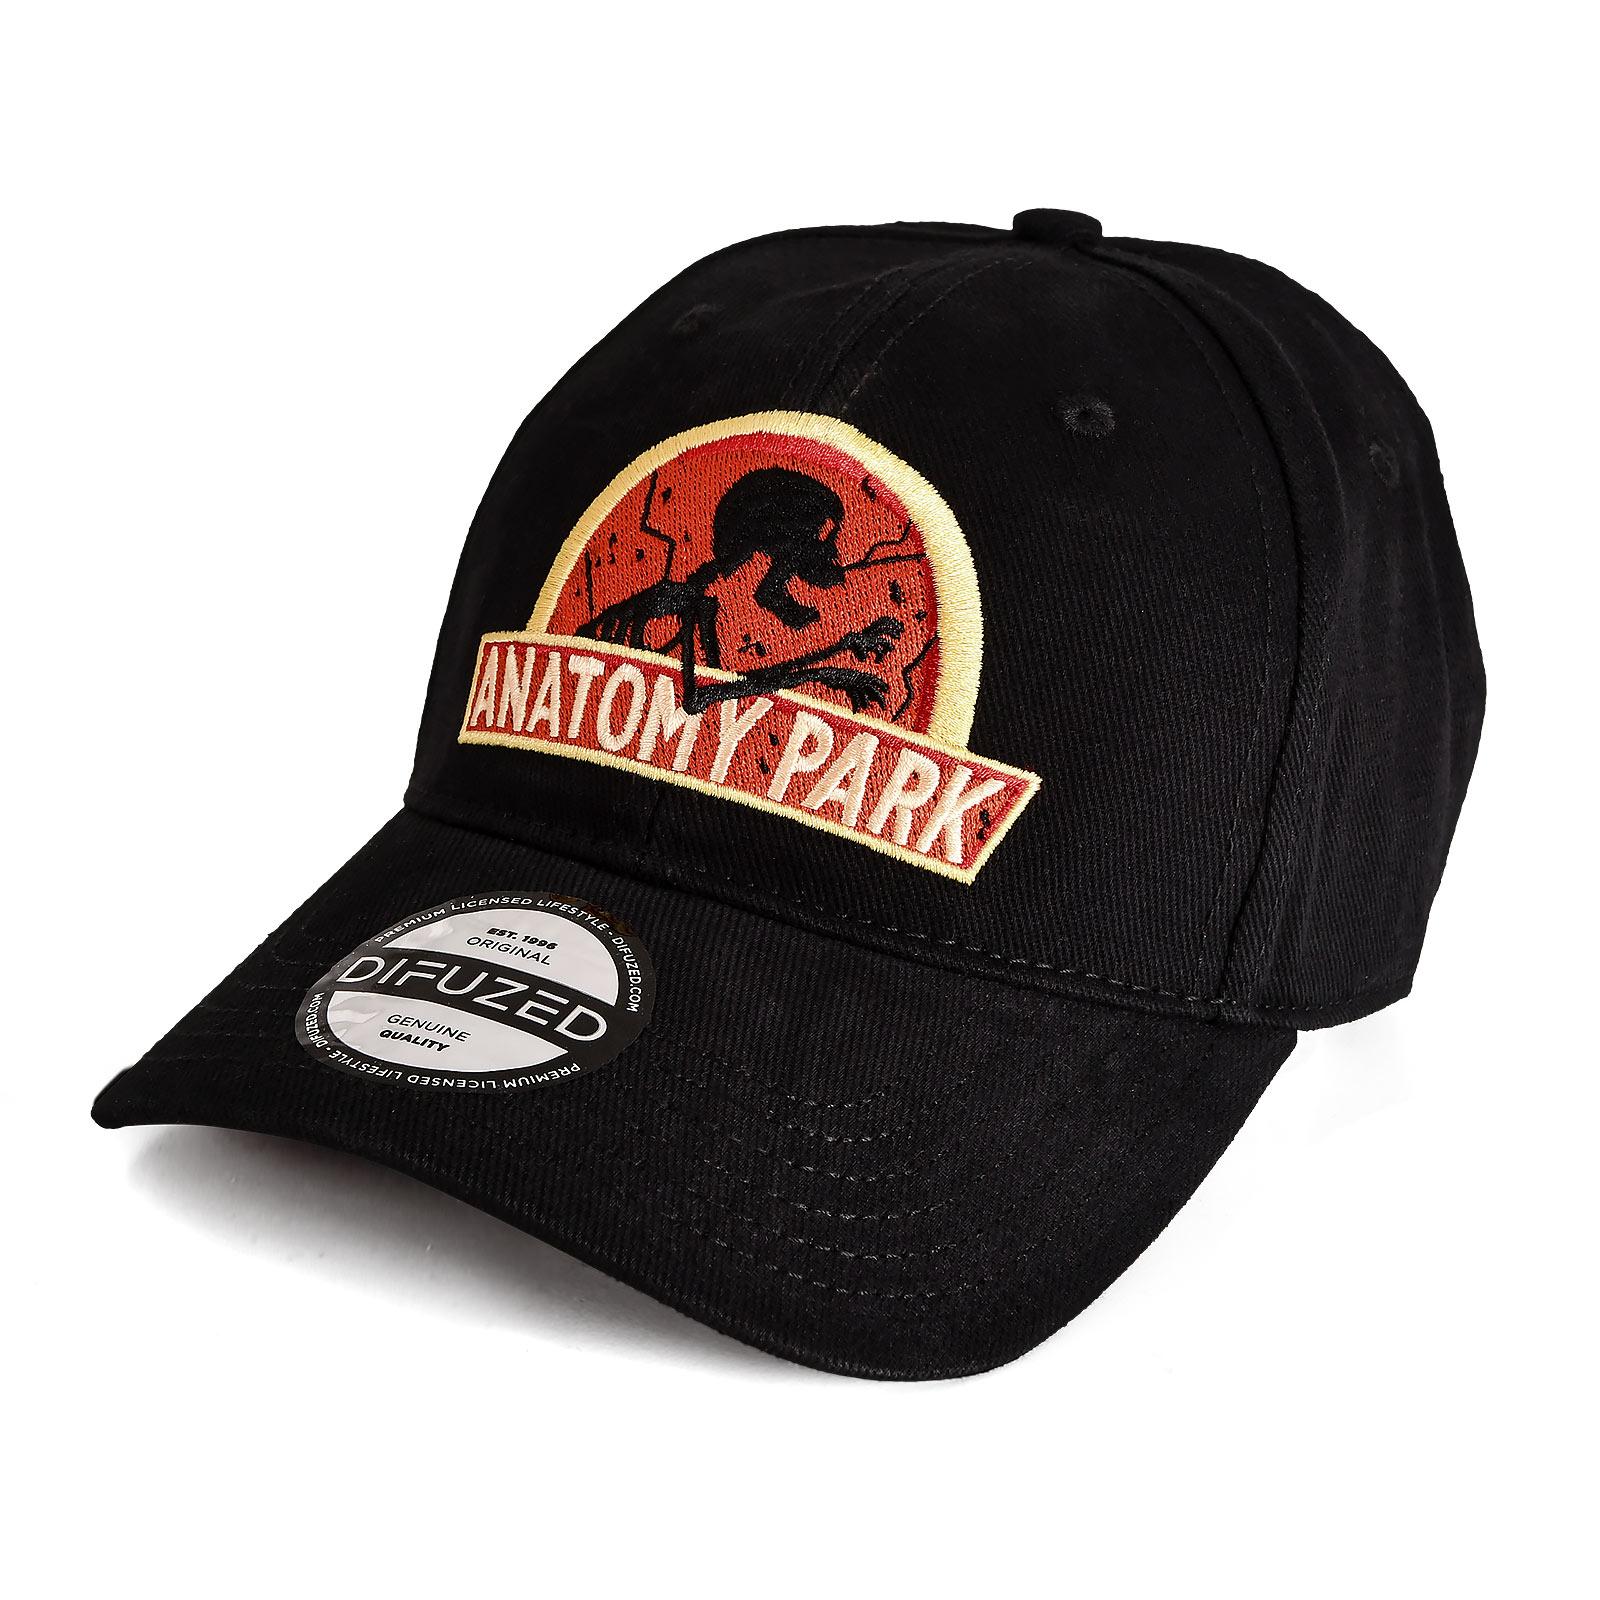 Rick and Morty - Anatomy Park Basecap